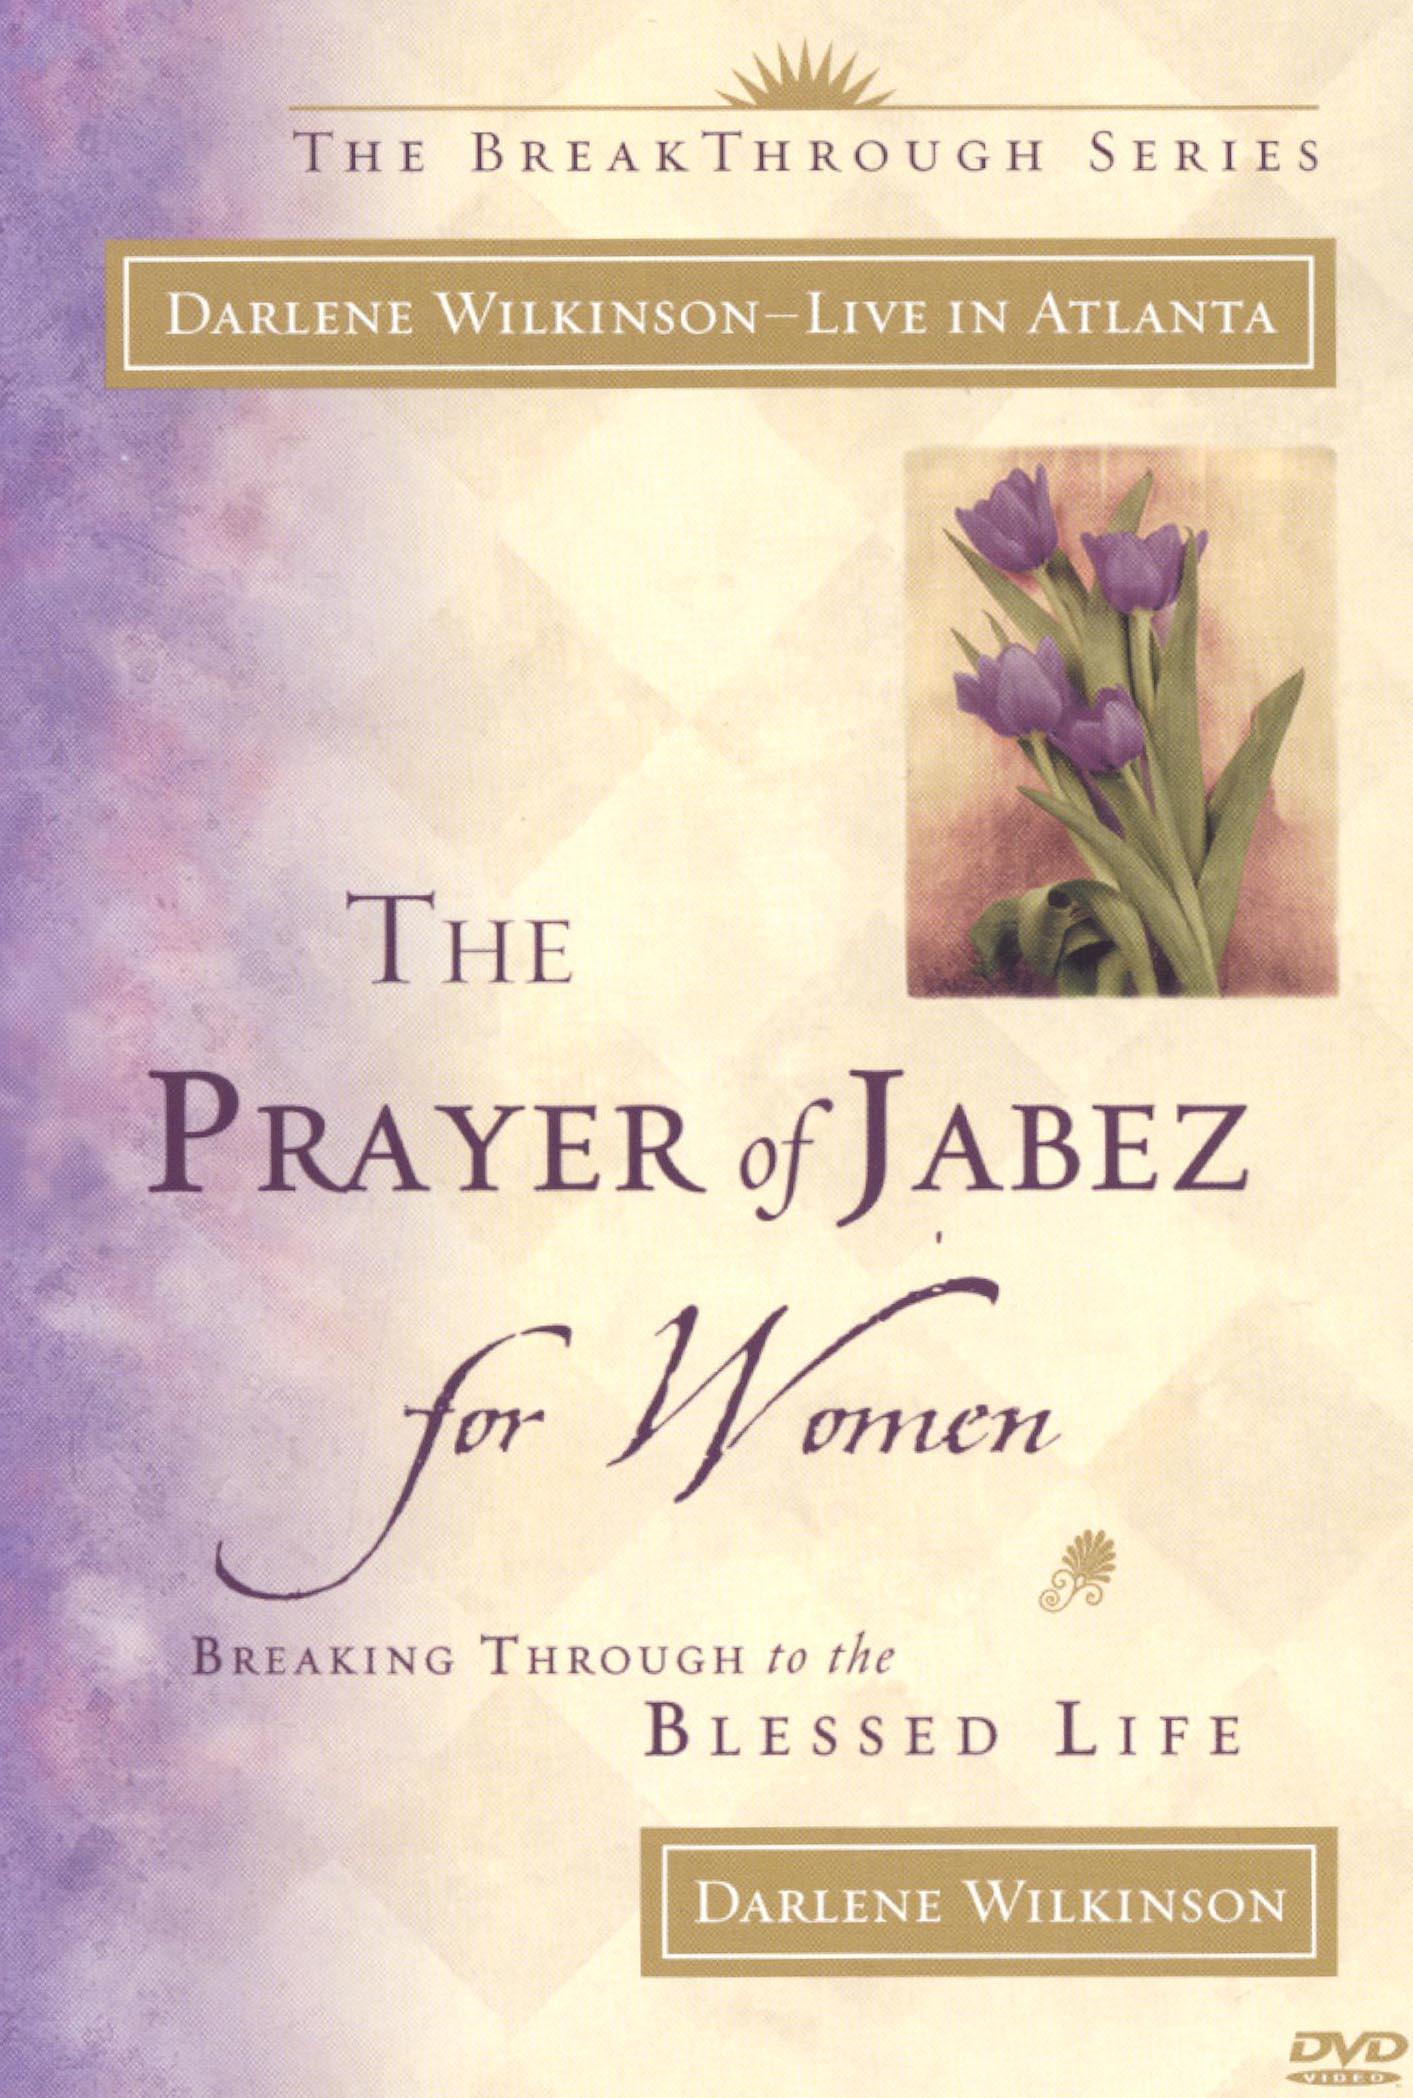 Darlene Wilkinson: The Prayer of Jabez for Women